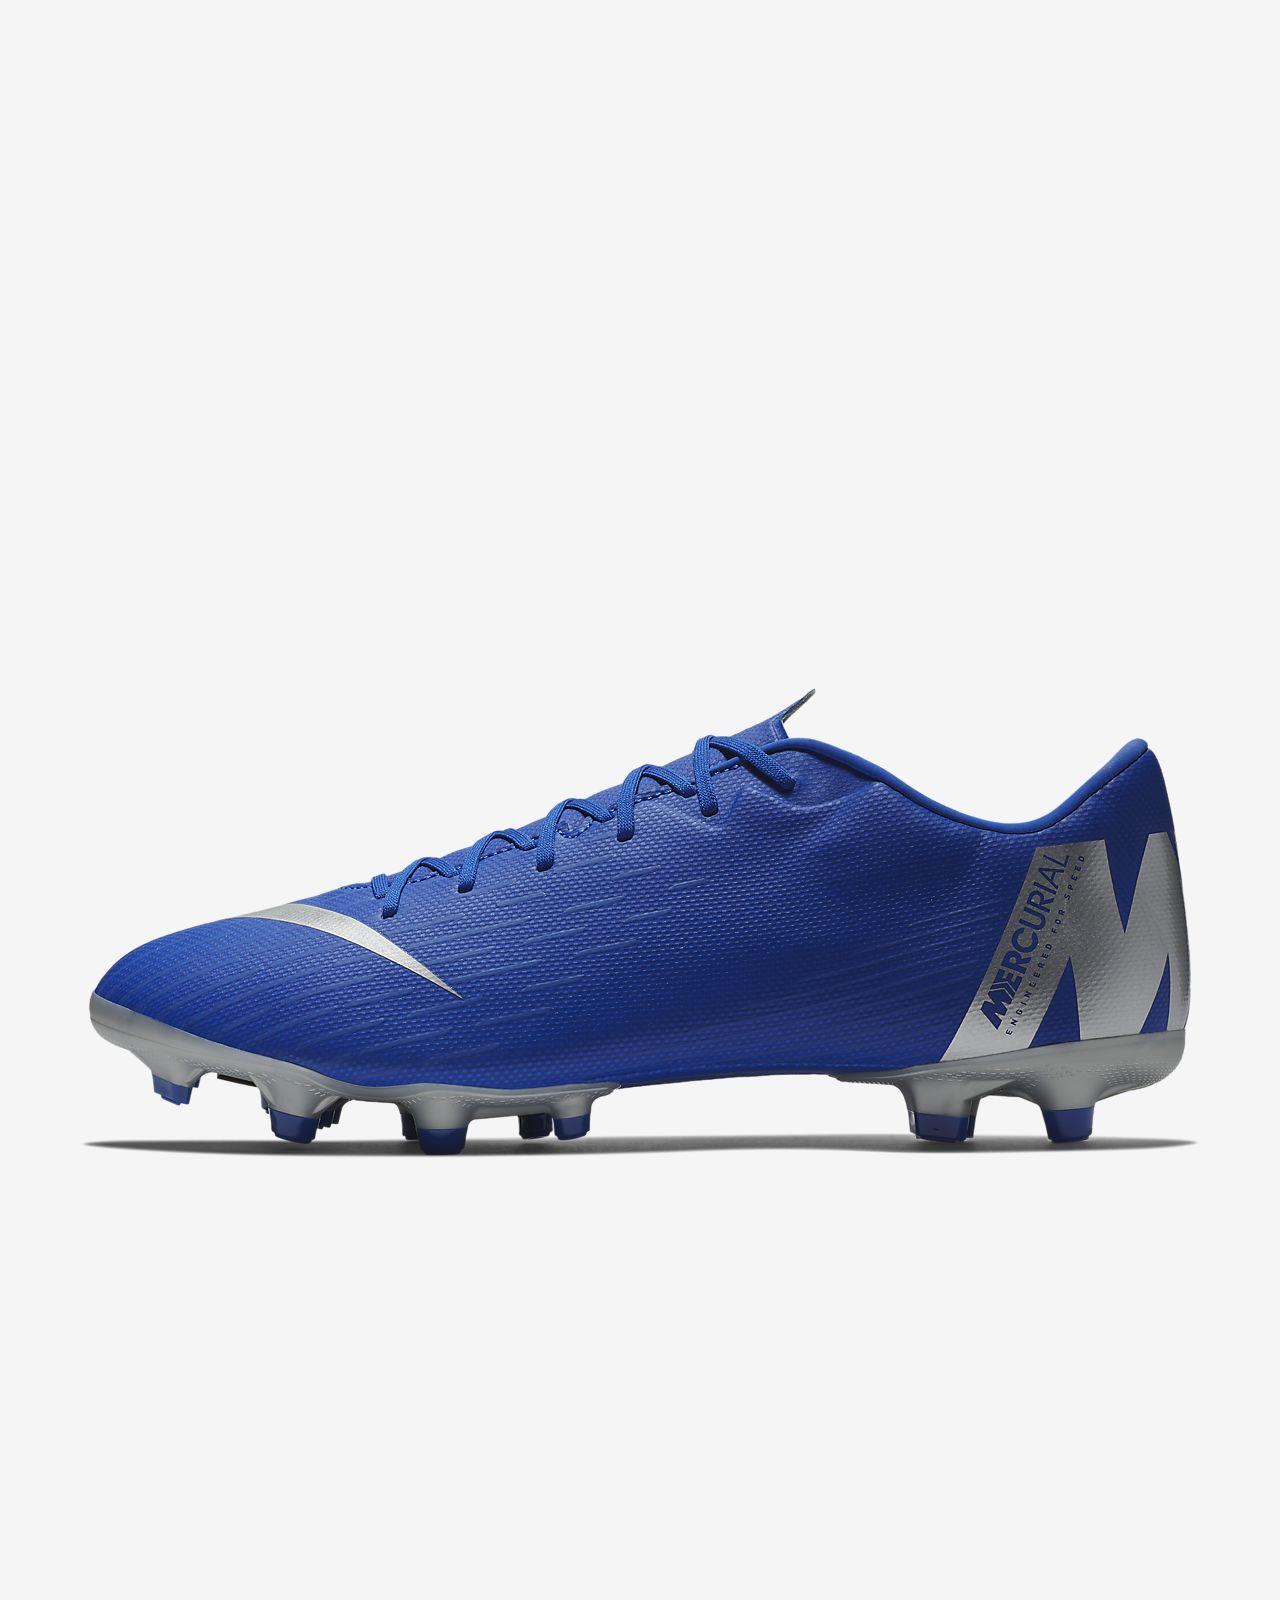 Nike Vapor 12 Academy MG Multi-Ground Football Boot